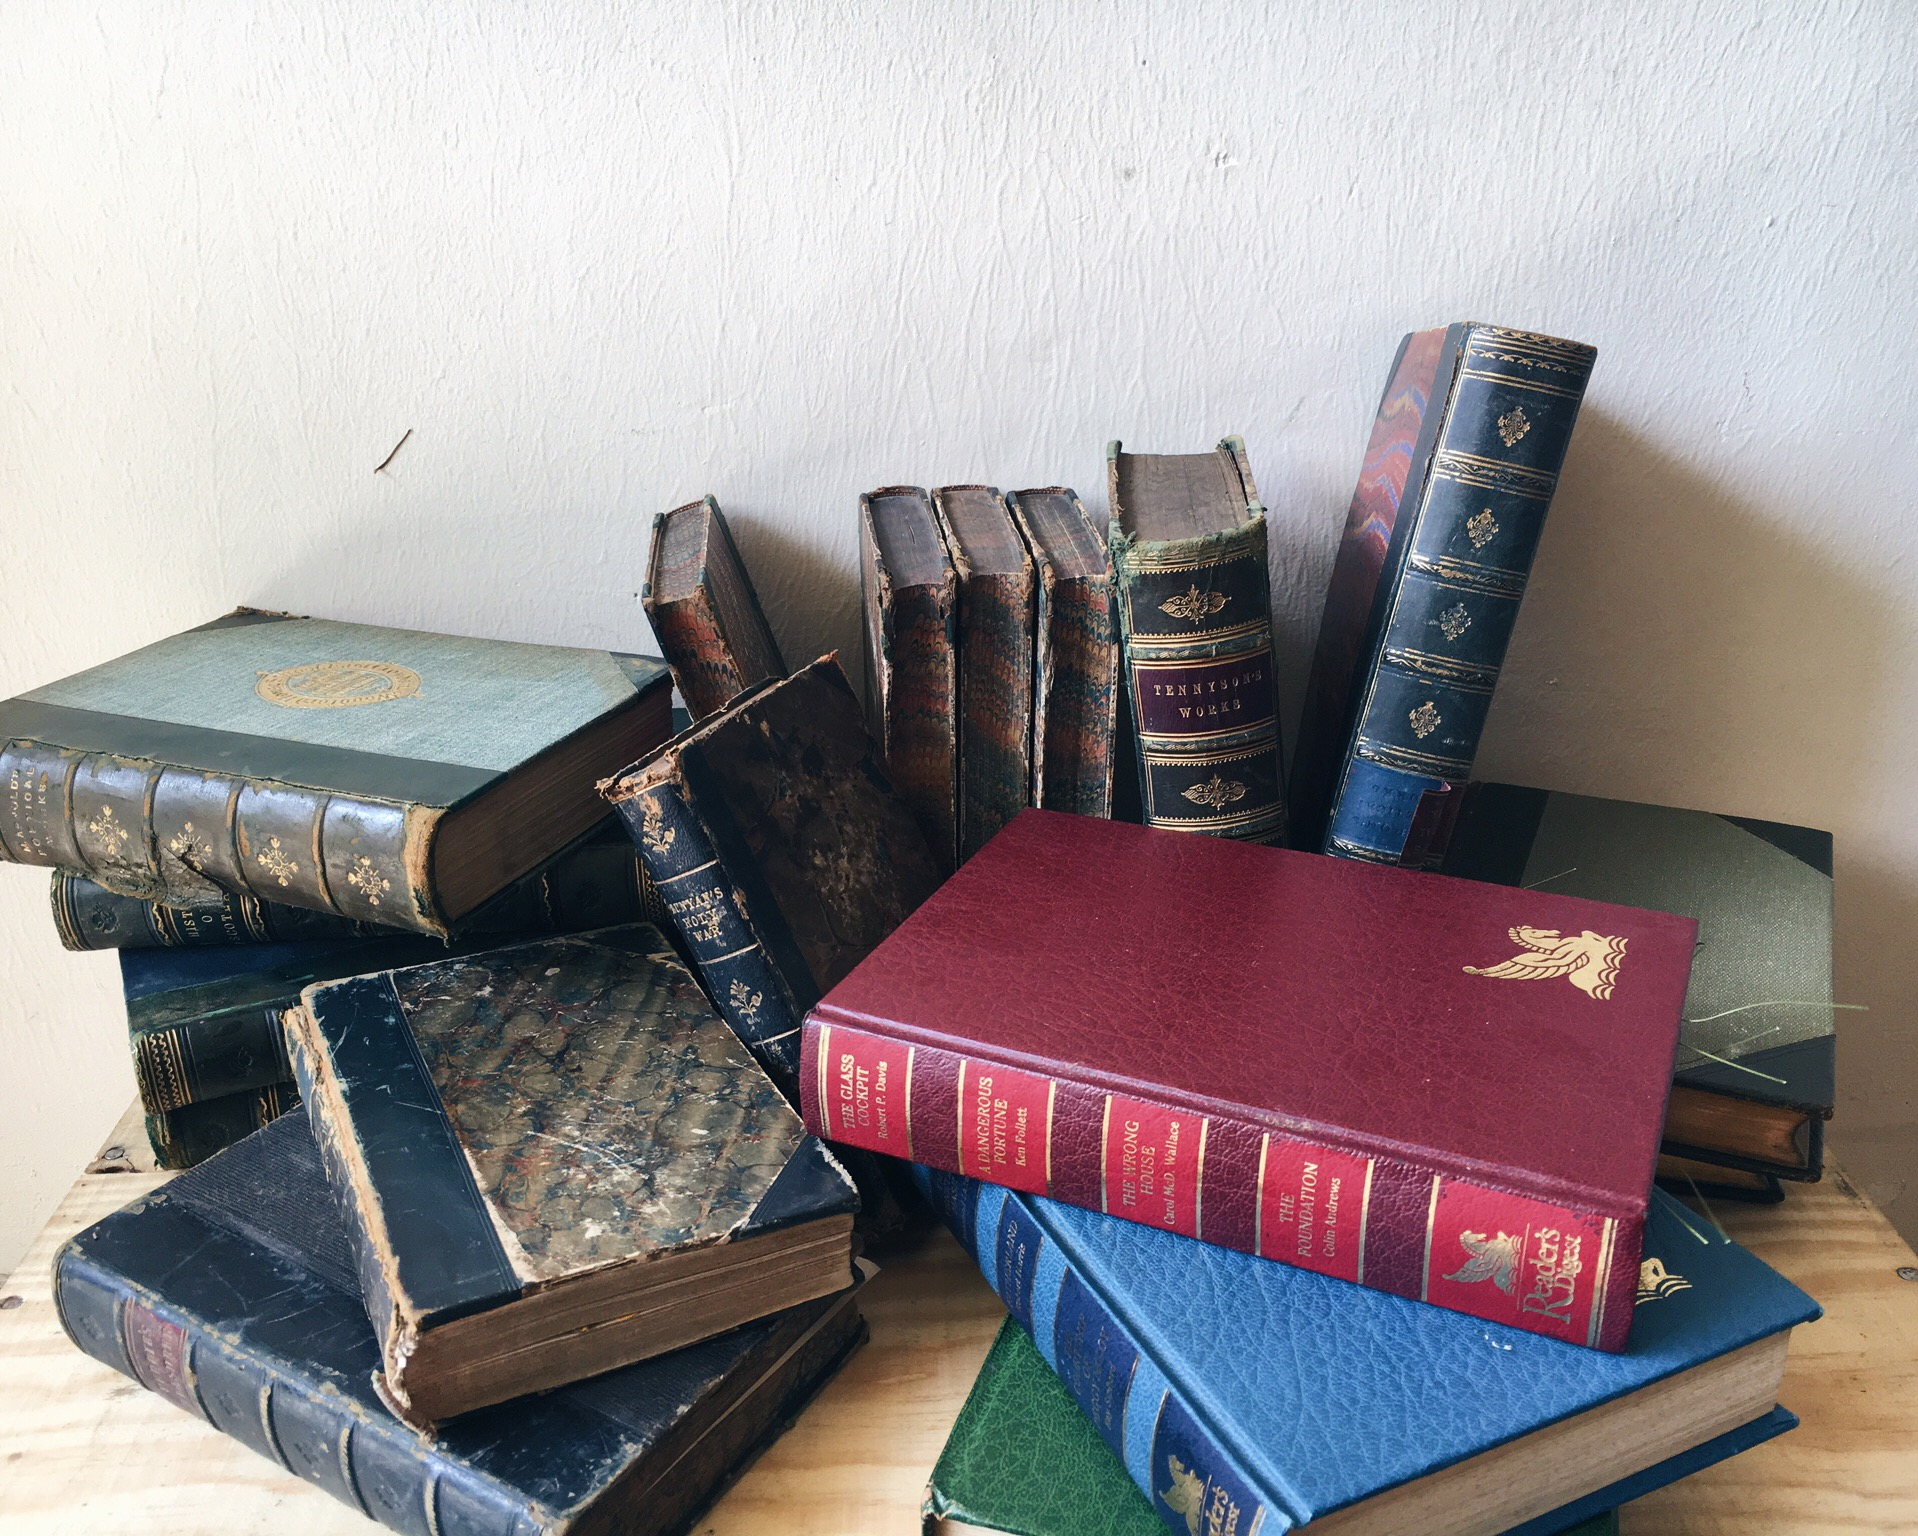 display books 3.JPG